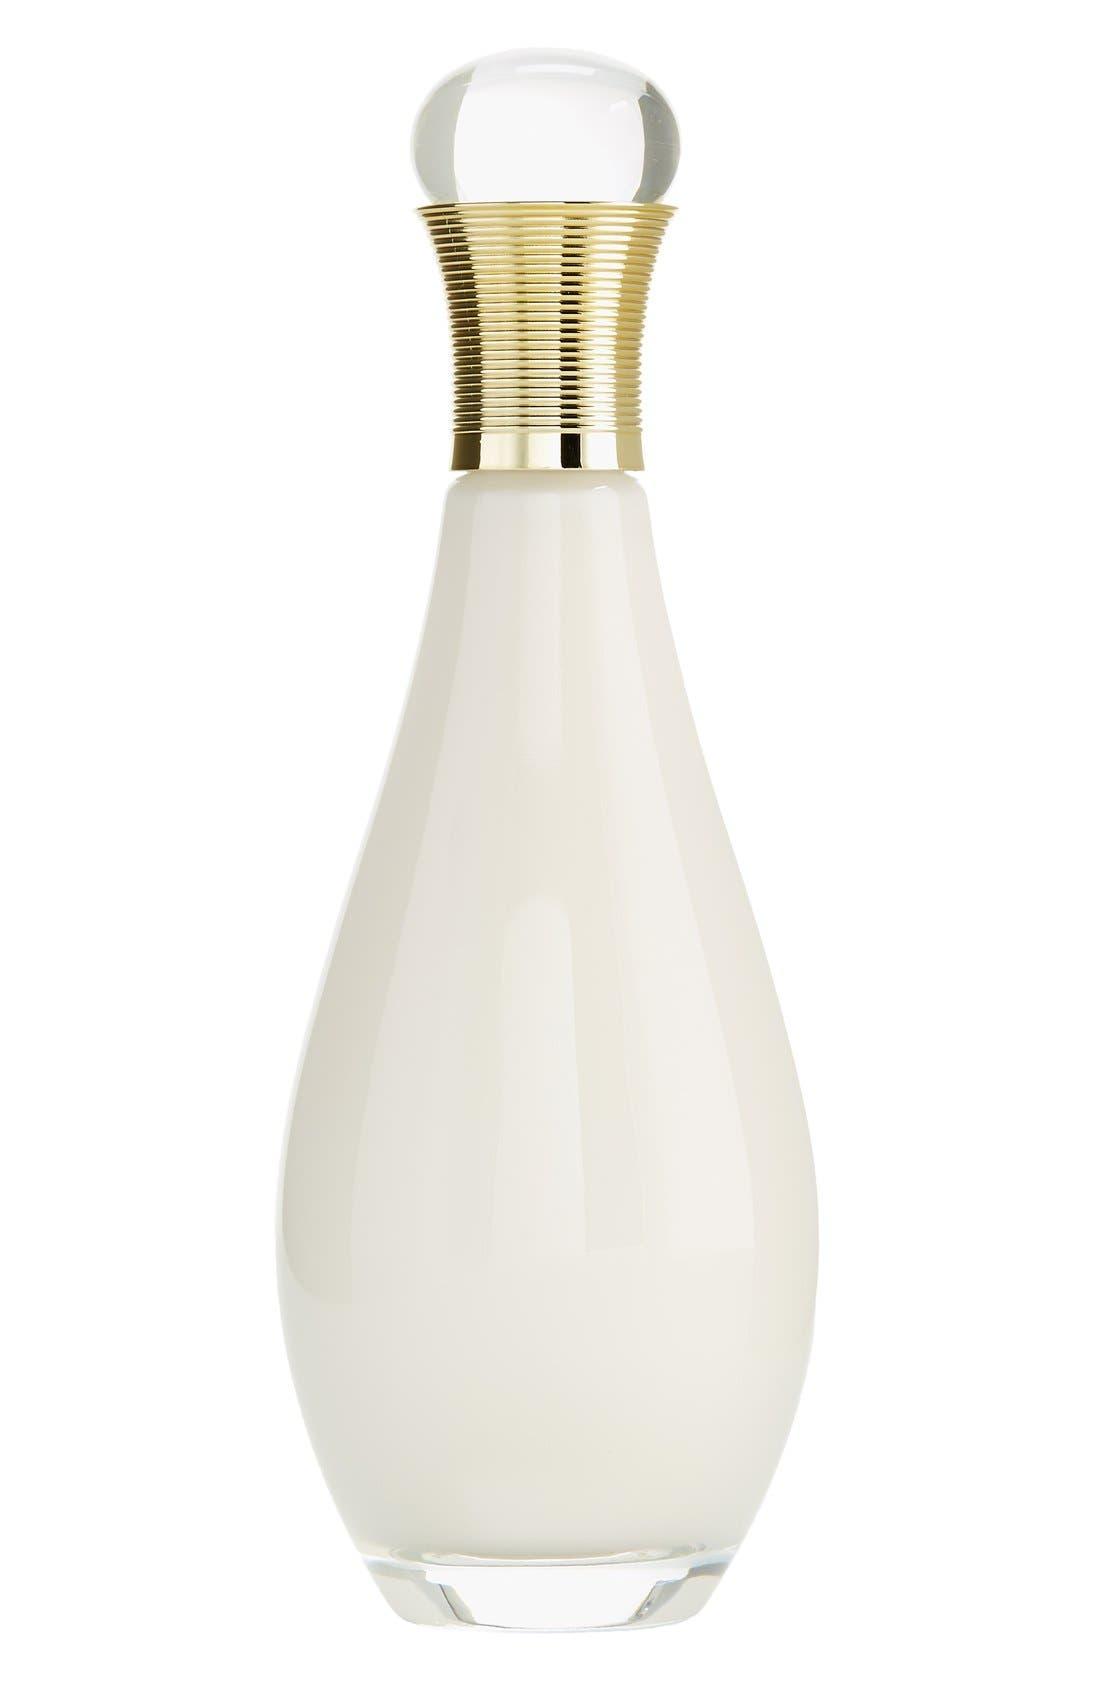 Dior 'J'adore' Beautifying Body Milk